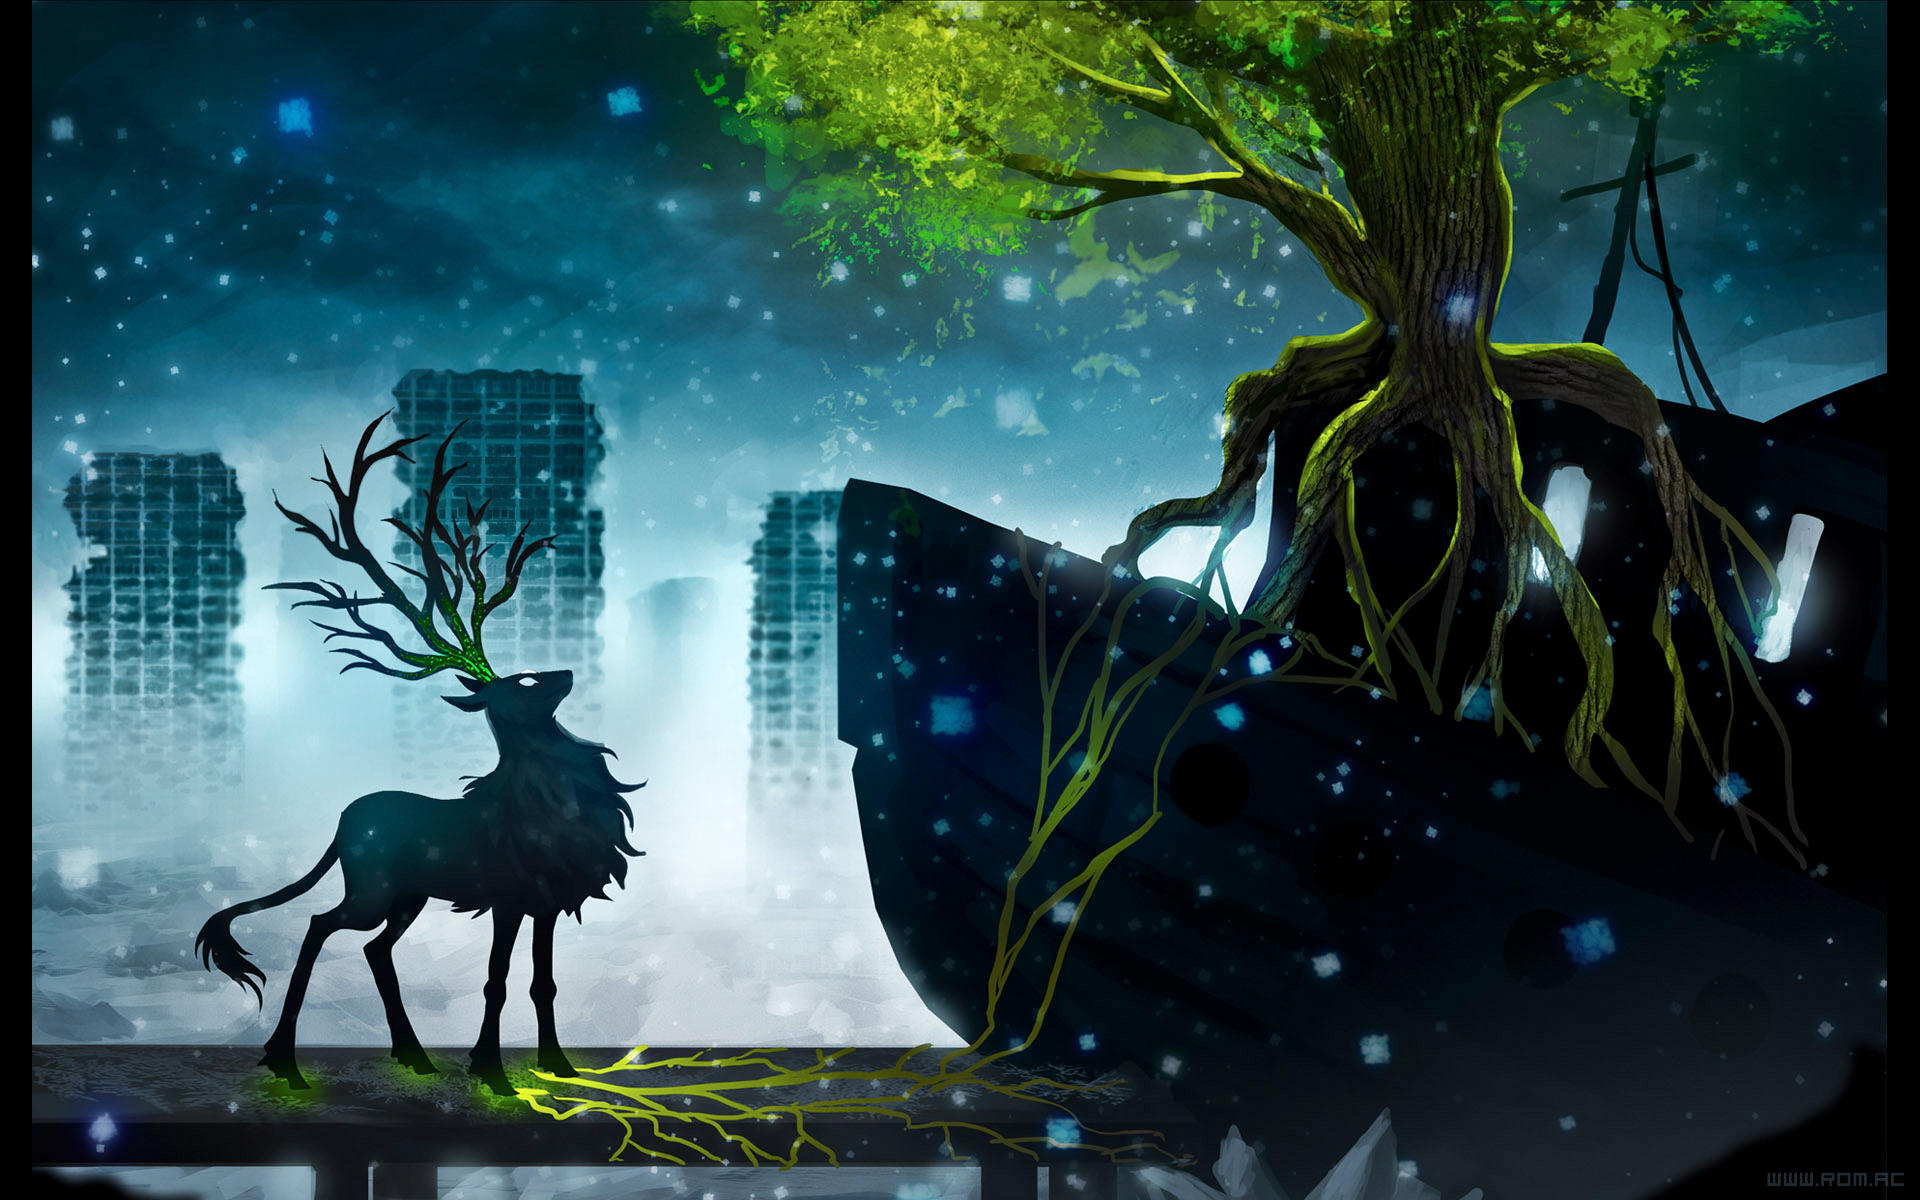 BOAT TREE by alexiuss